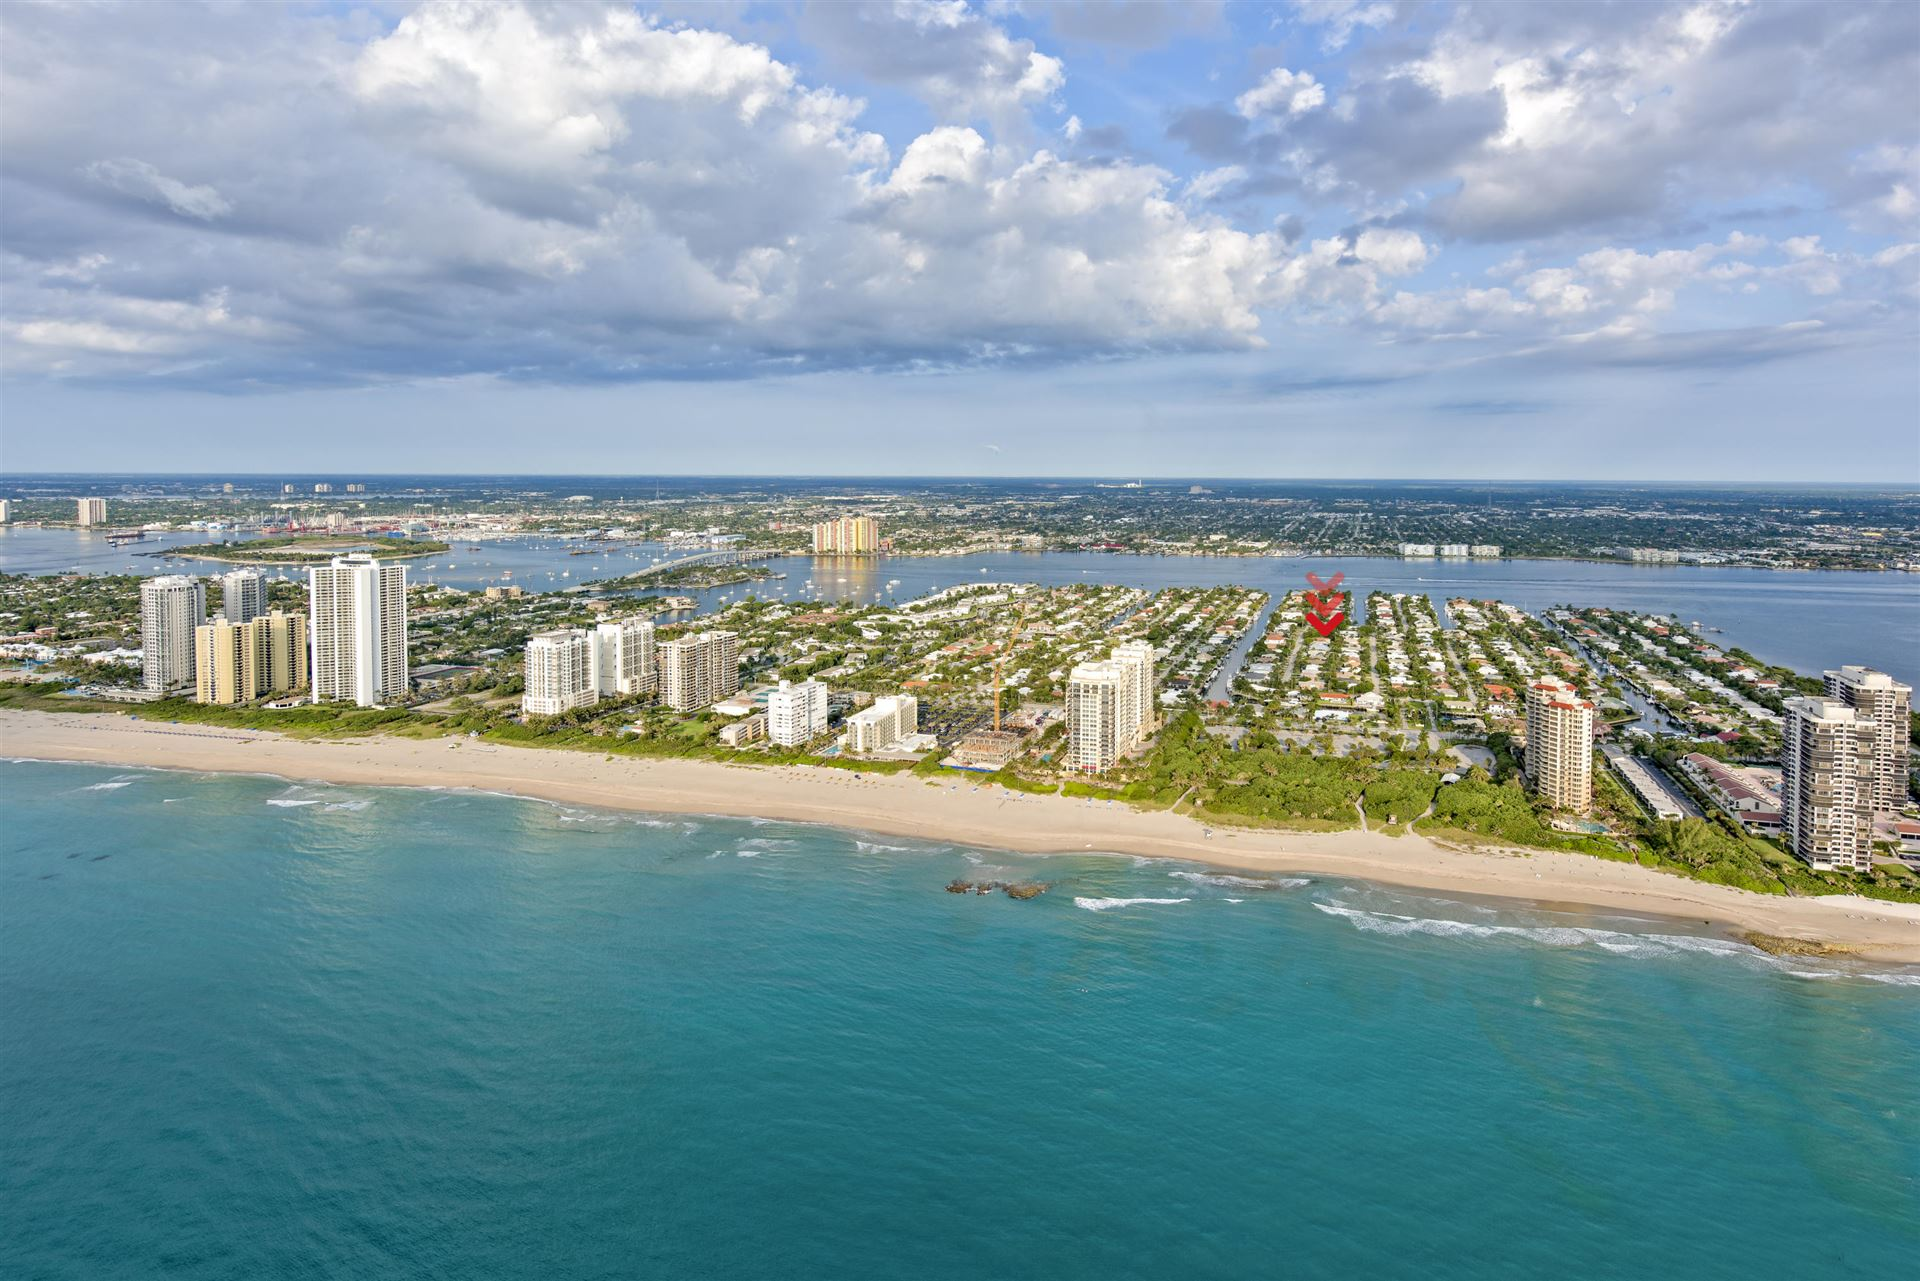 Photo of 1140 Coral Way, Singer Island, FL 33404 (MLS # RX-10624102)